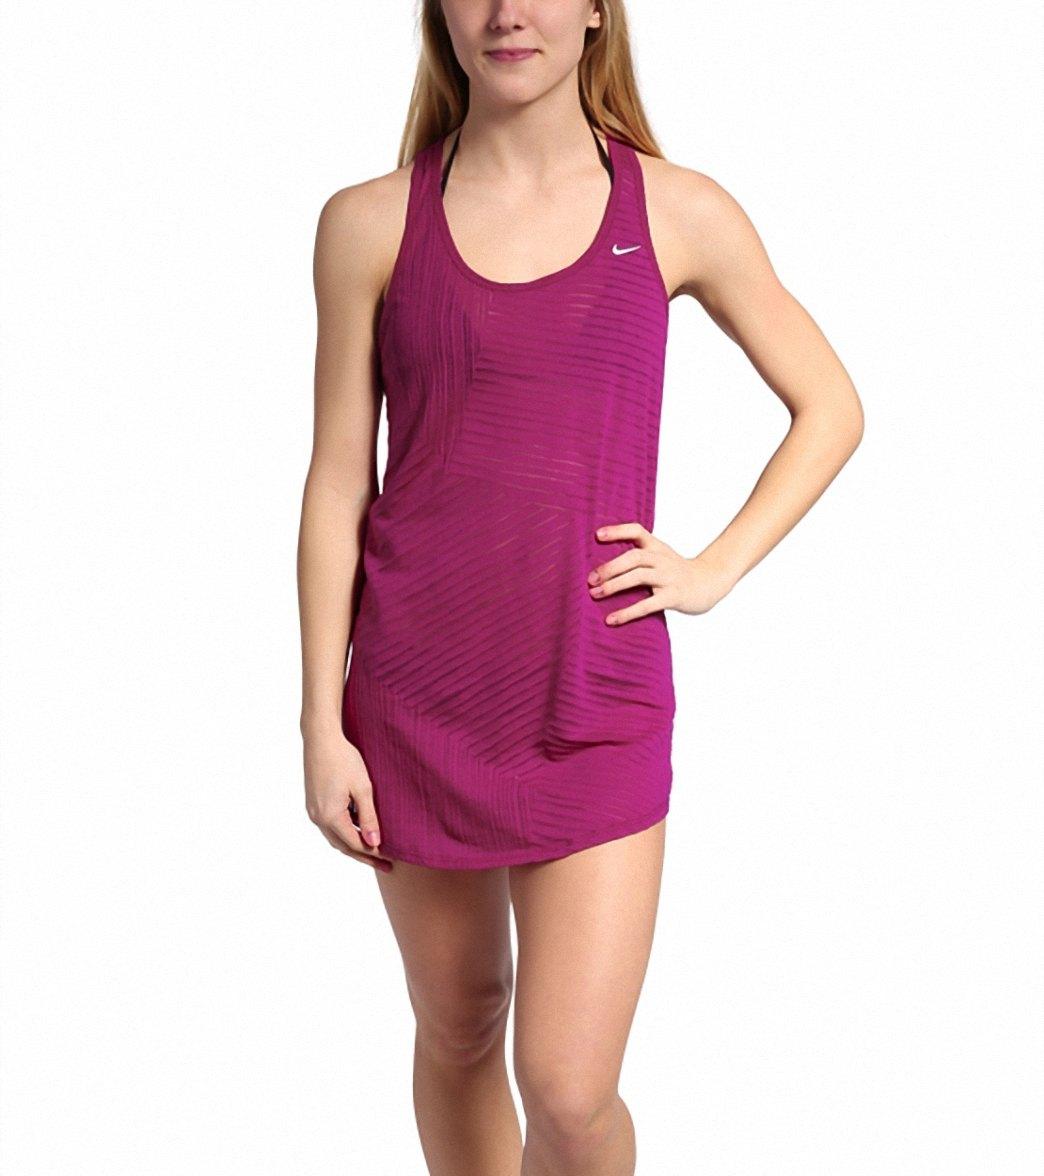 2d684a8832db4 ... Nike Swim Women's Cover-up Tank Dress. Play Video. MODEL MEASUREMENTS